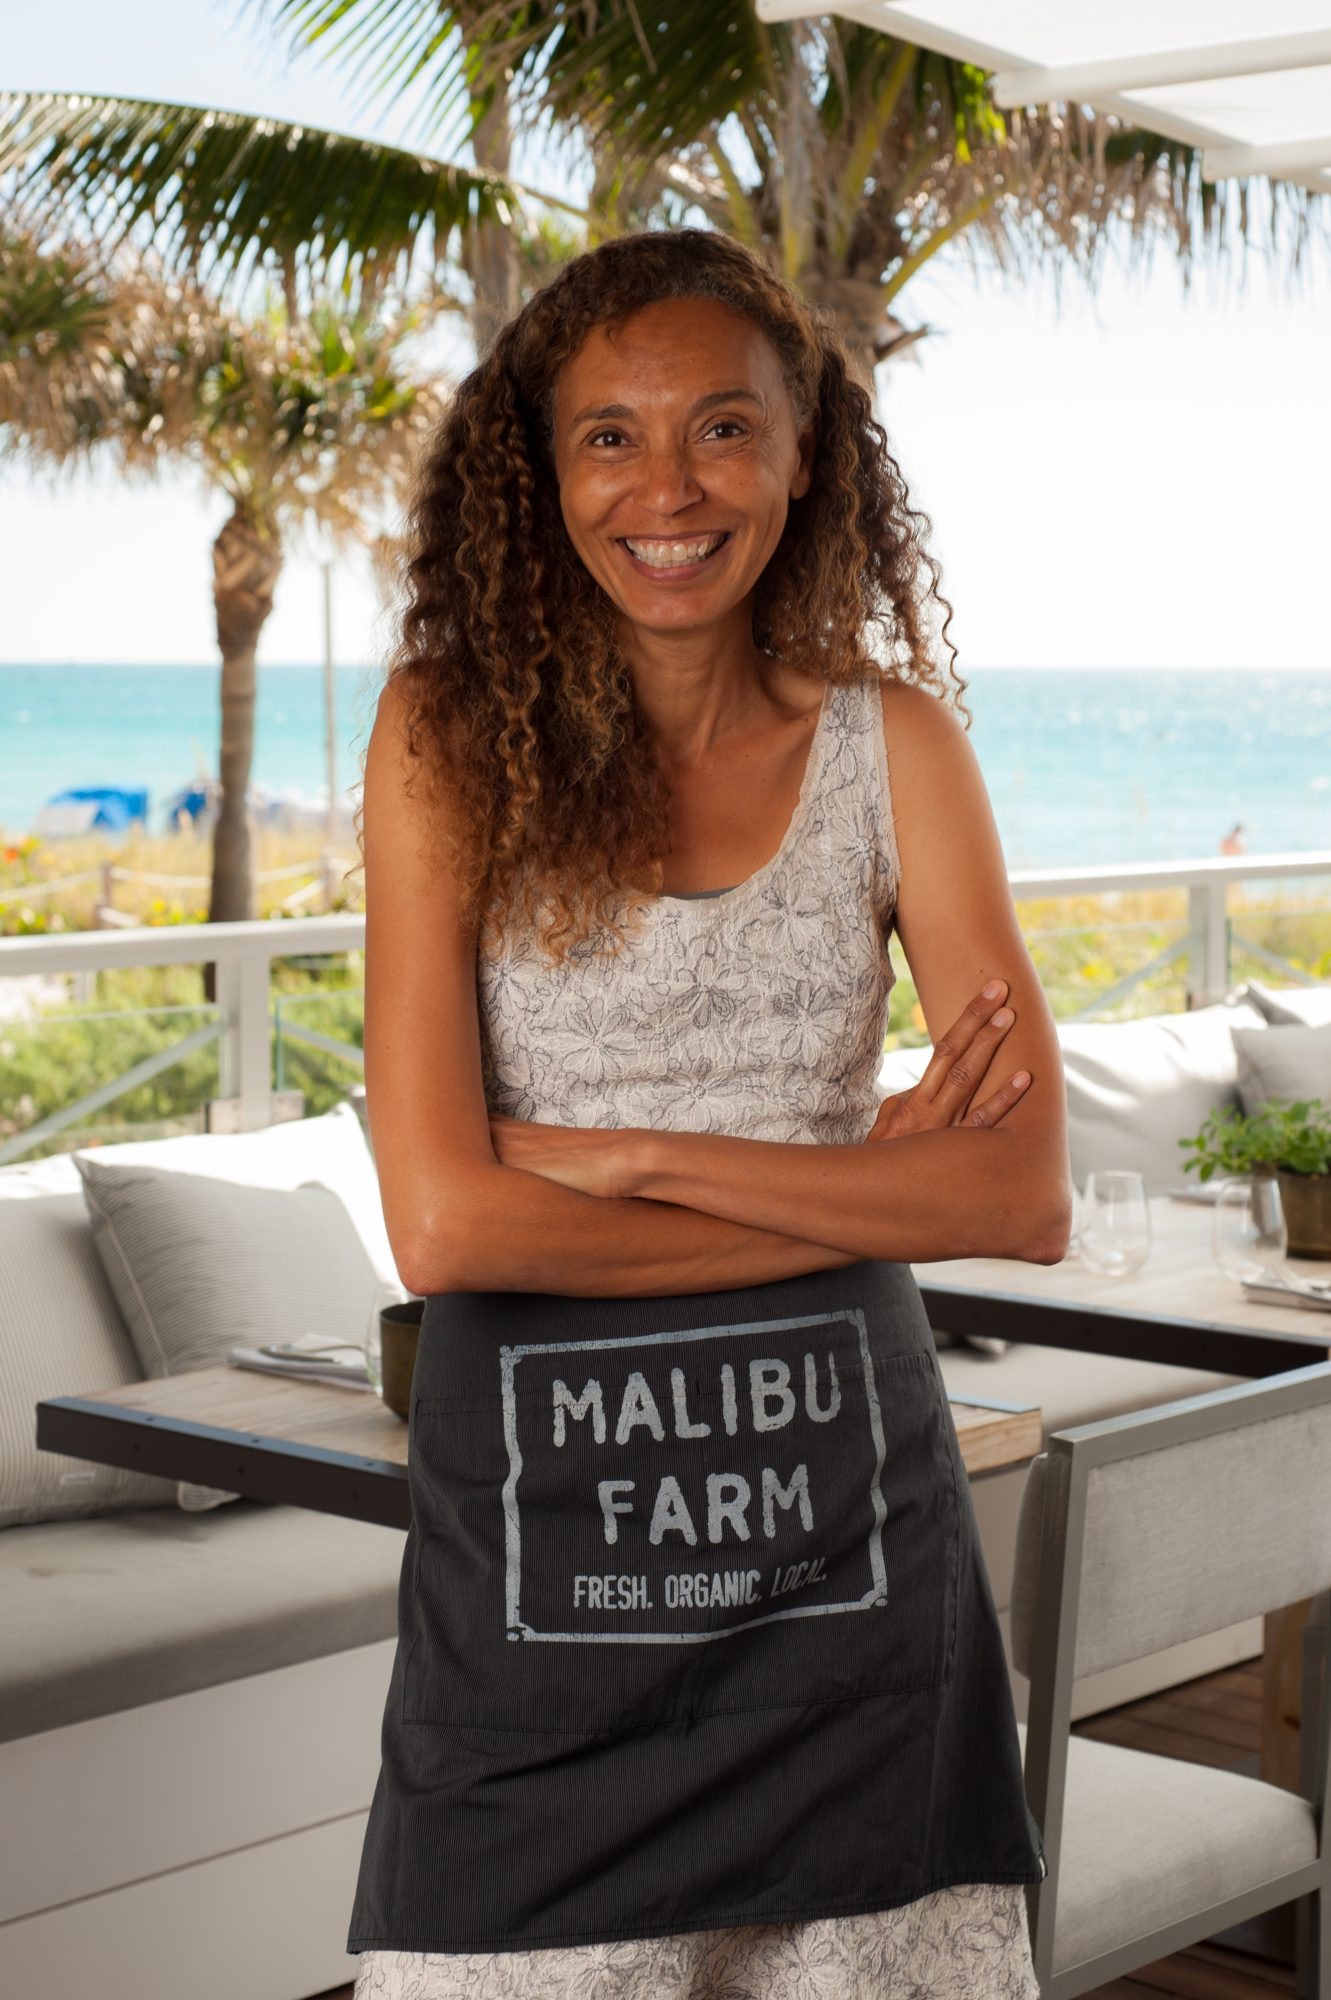 Helene Henderson, owner of Malibu Farm in Miami